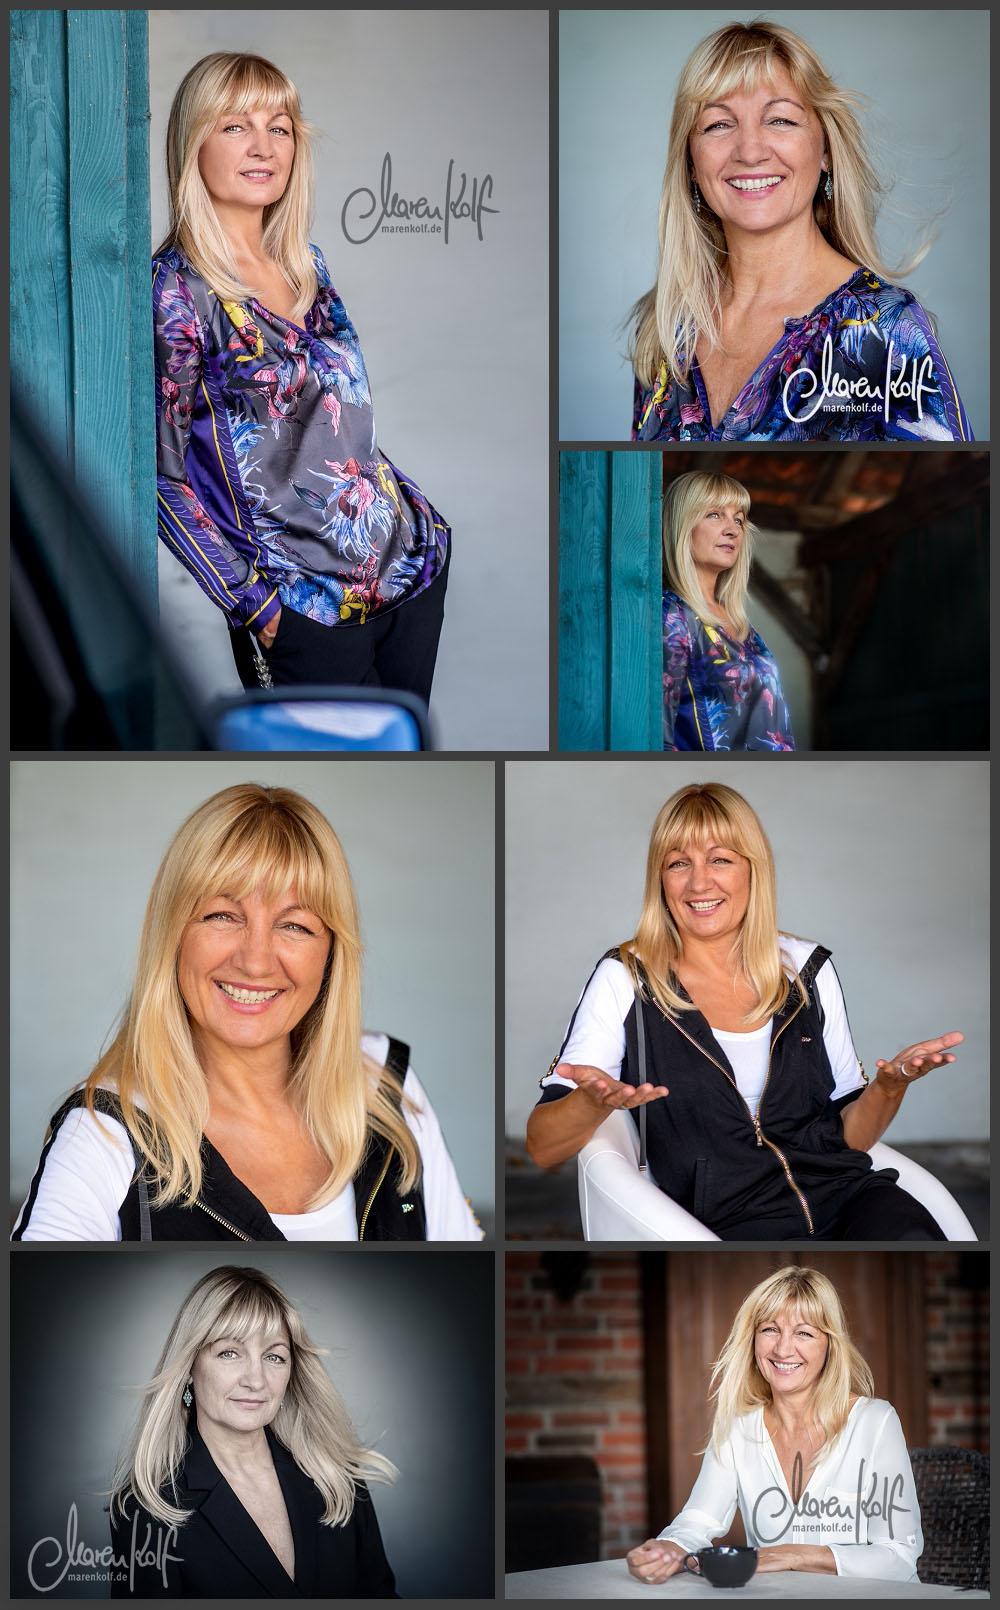 businessportrait-fotograf-hannover-heidi-förster-coaching-maren-kolf-fotografie-wedemark